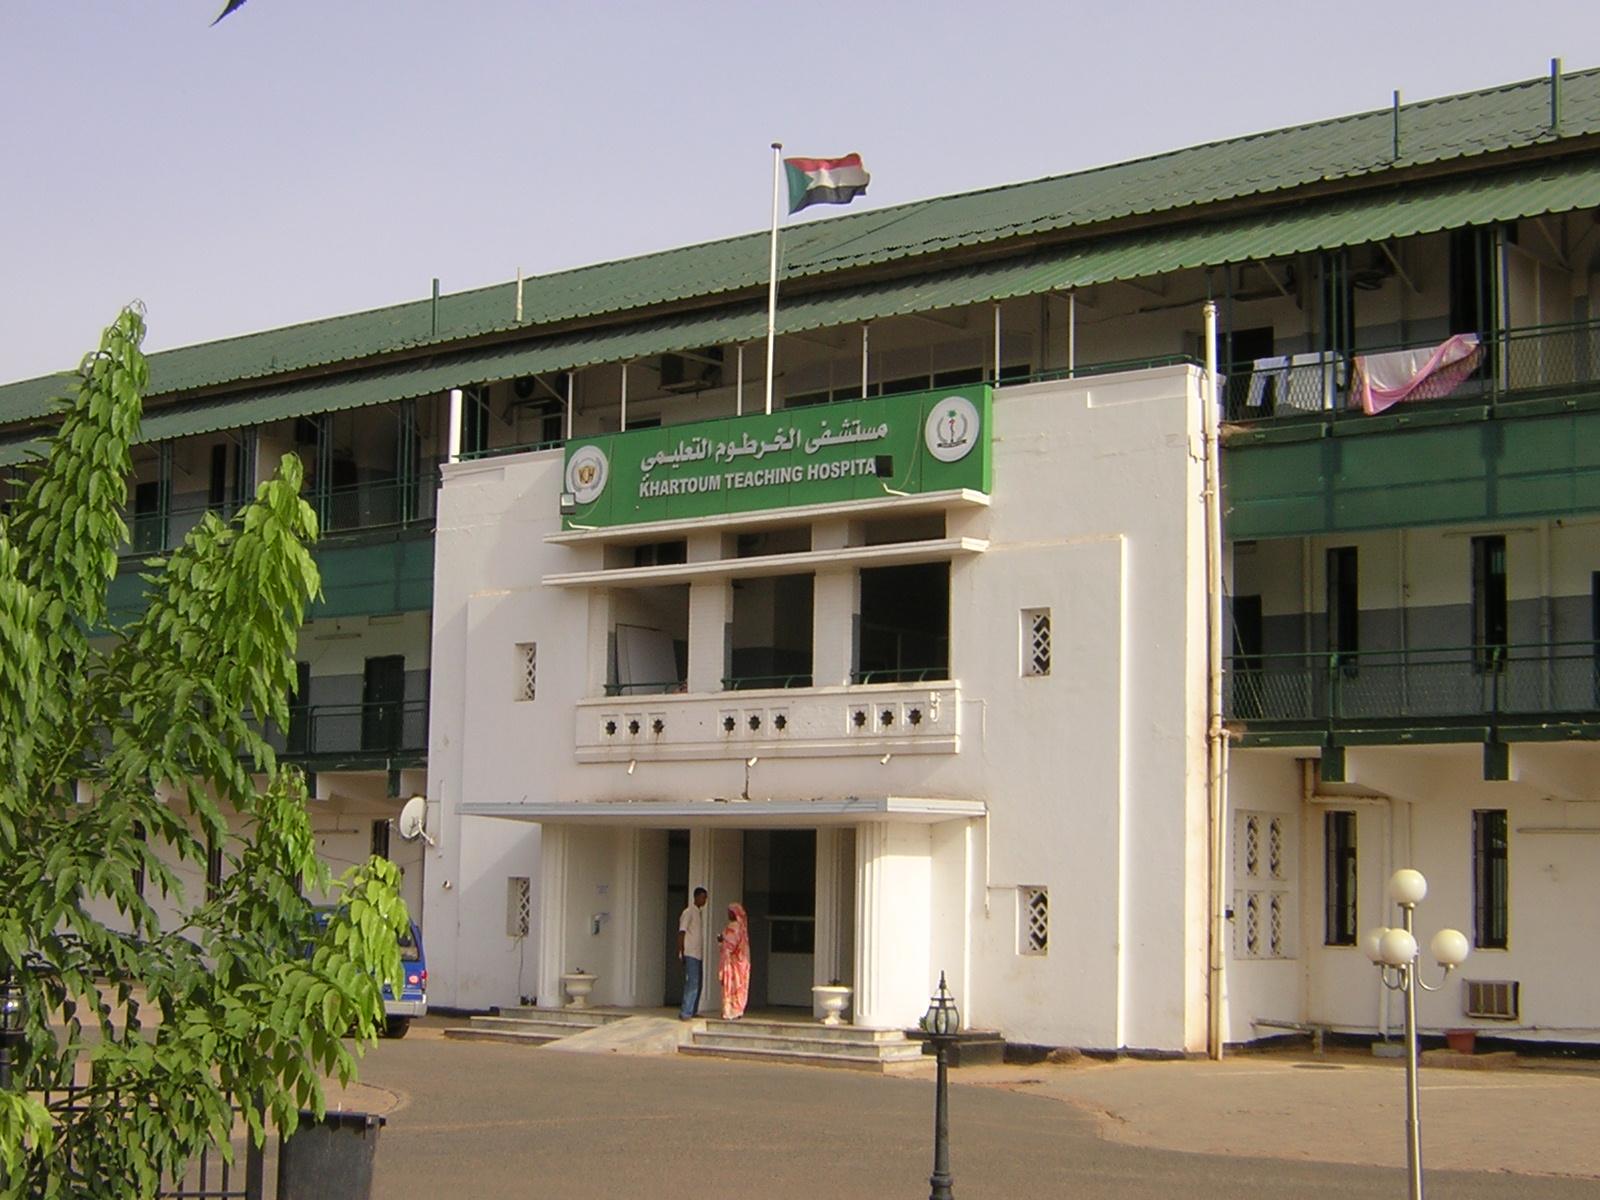 Khartoum Teaching Hospital_001